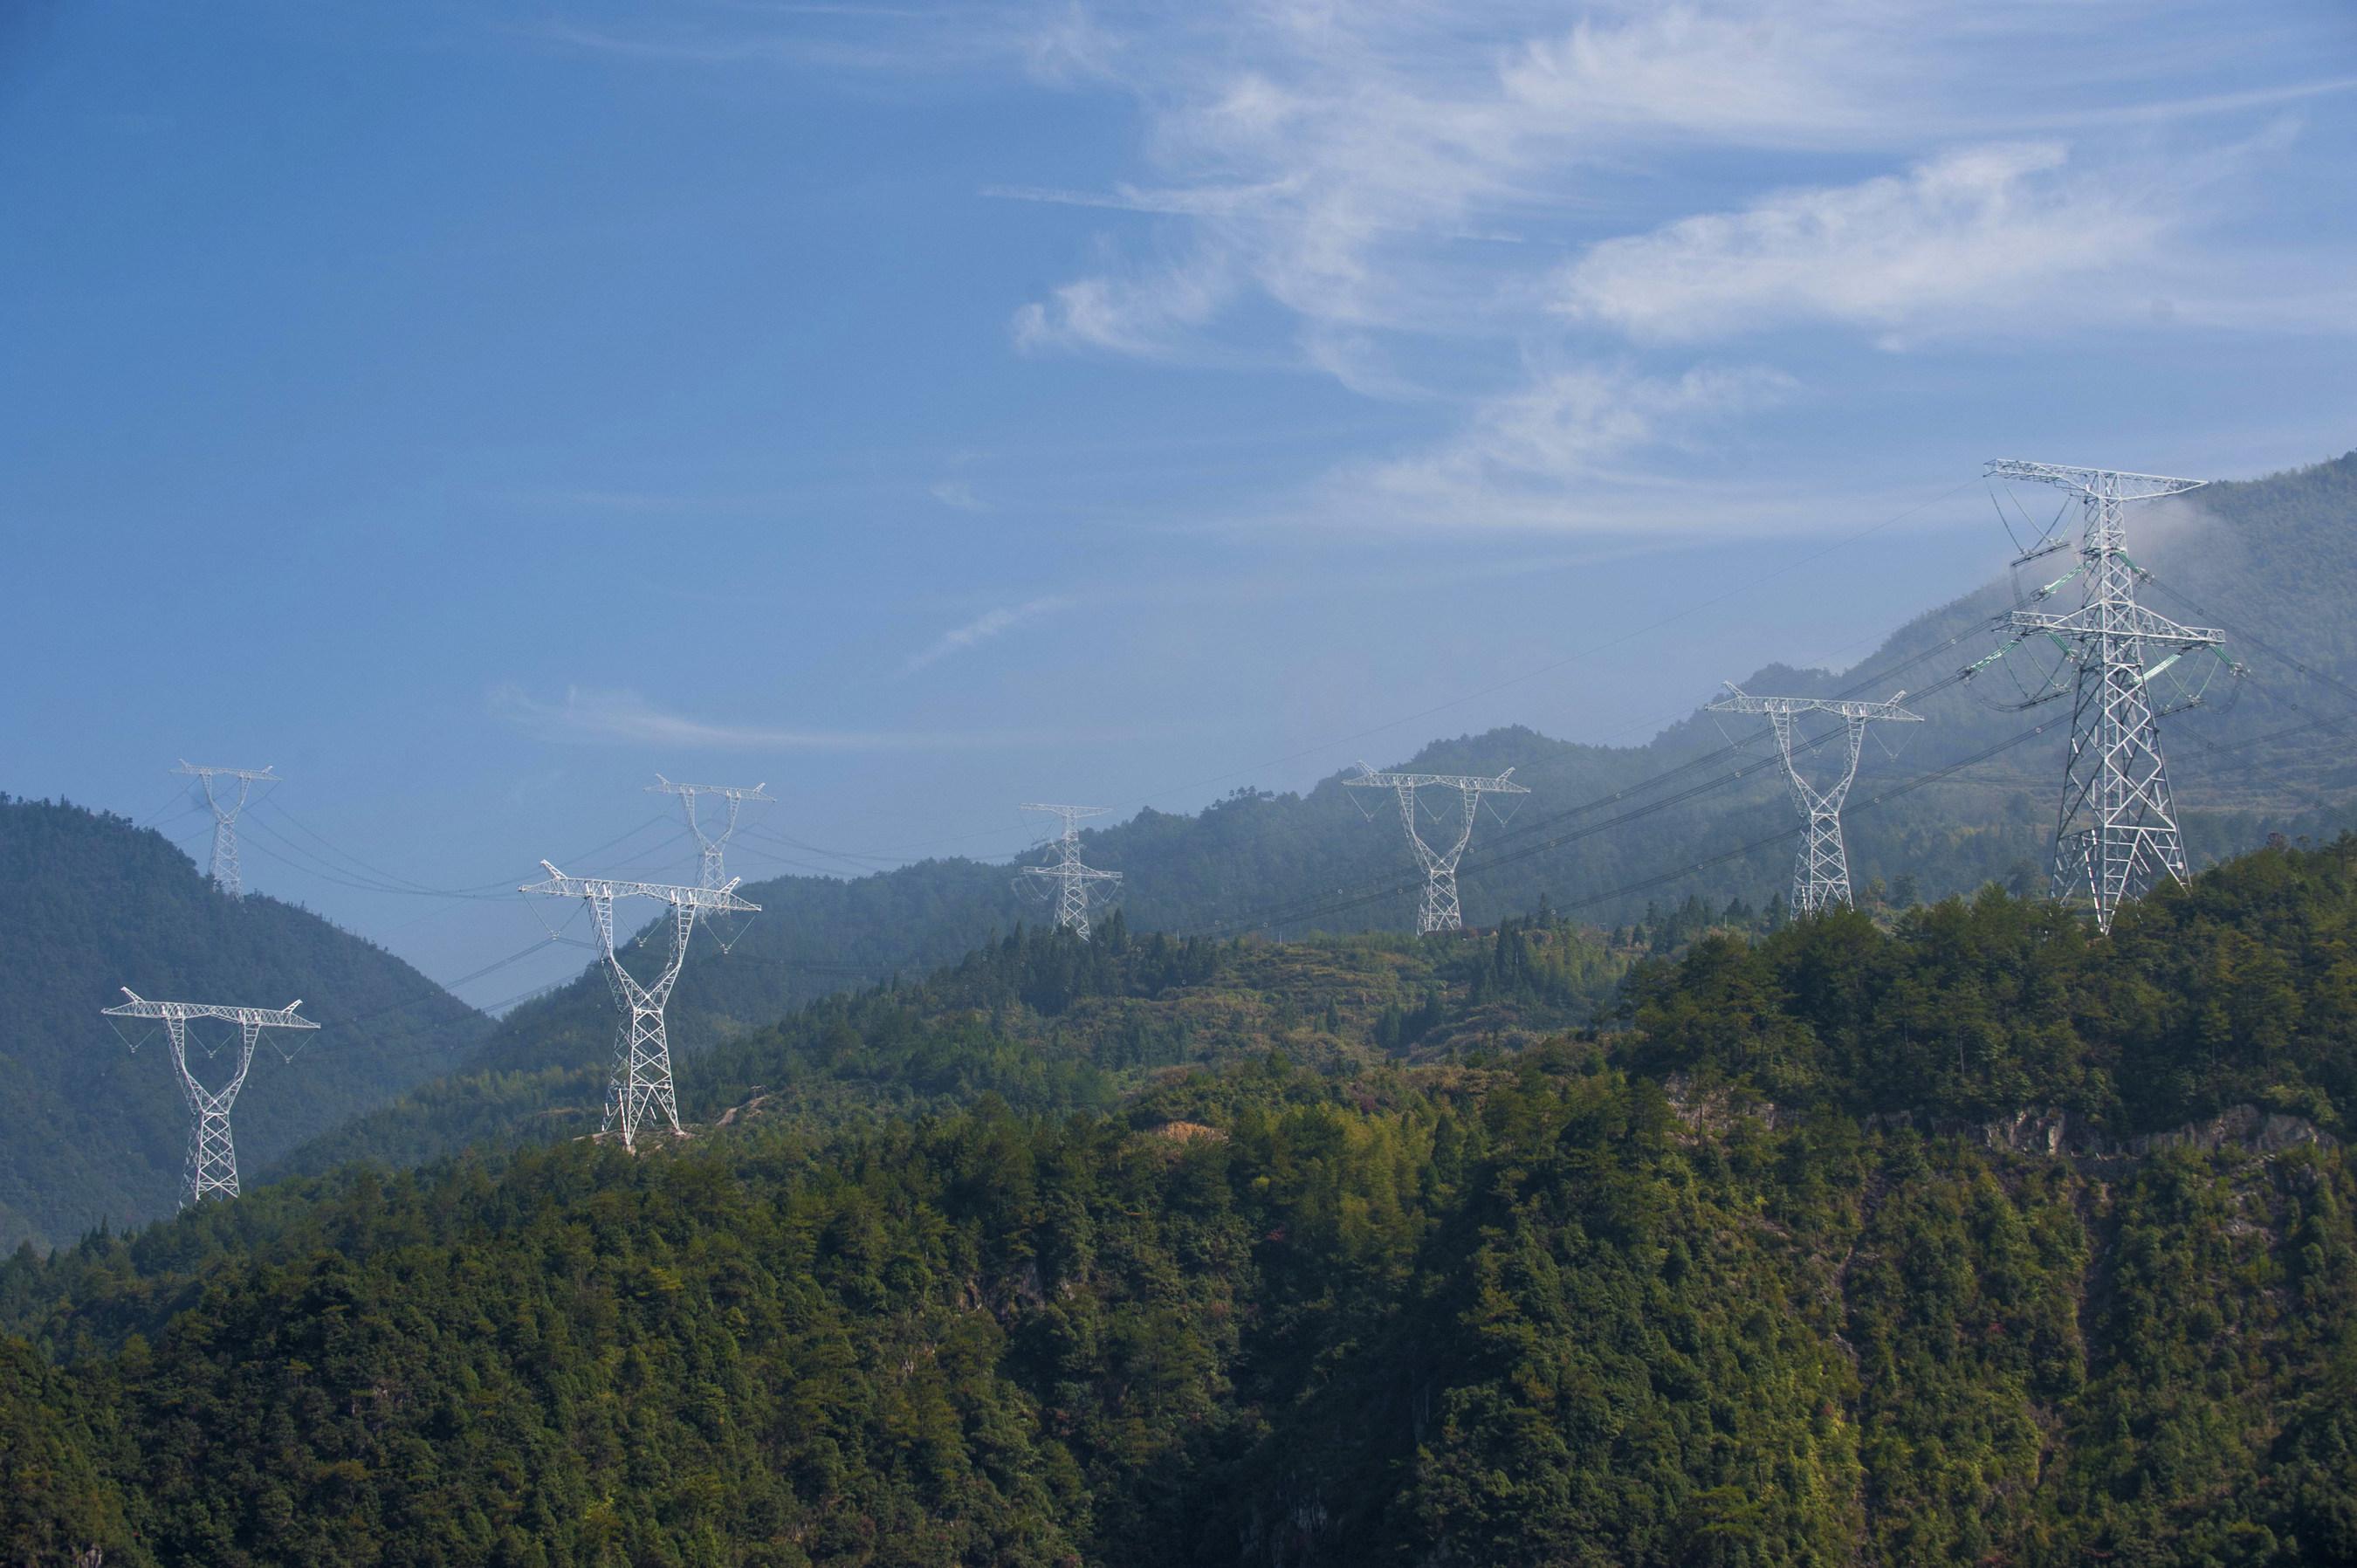 Zhebei-Fuzhou 1000kV UHV AC Project